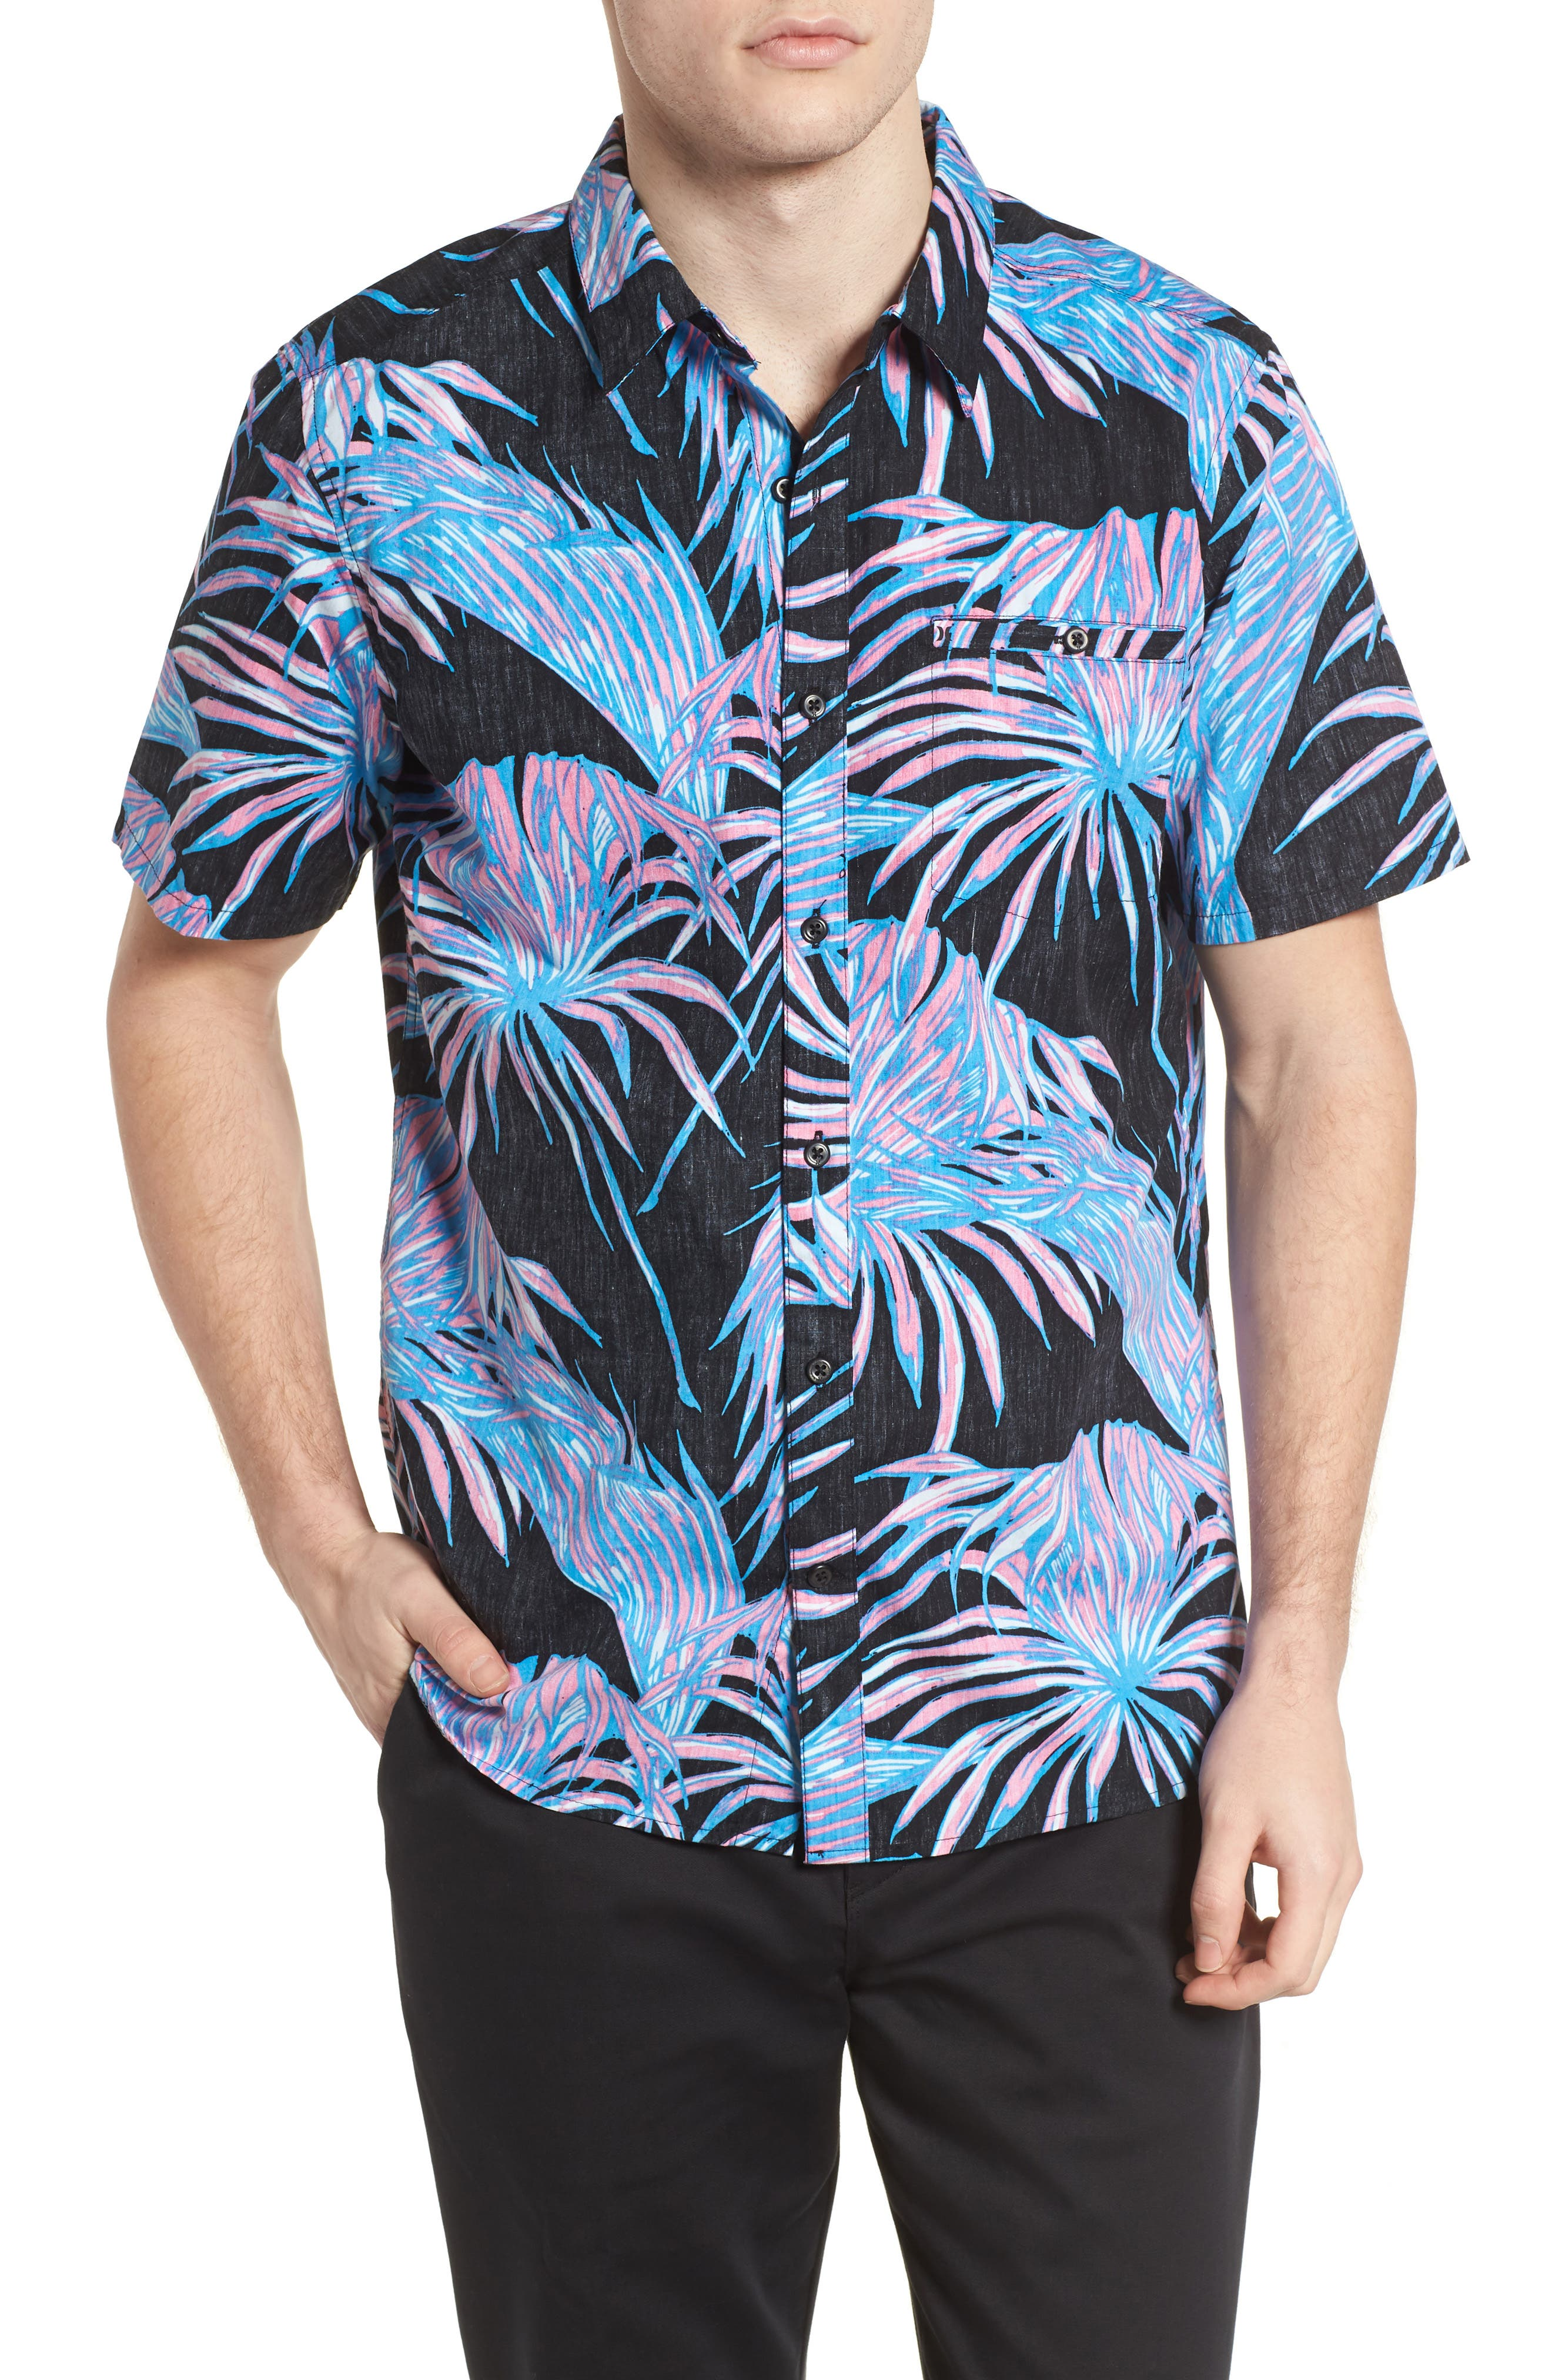 Koko Shirt,                         Main,                         color, 010